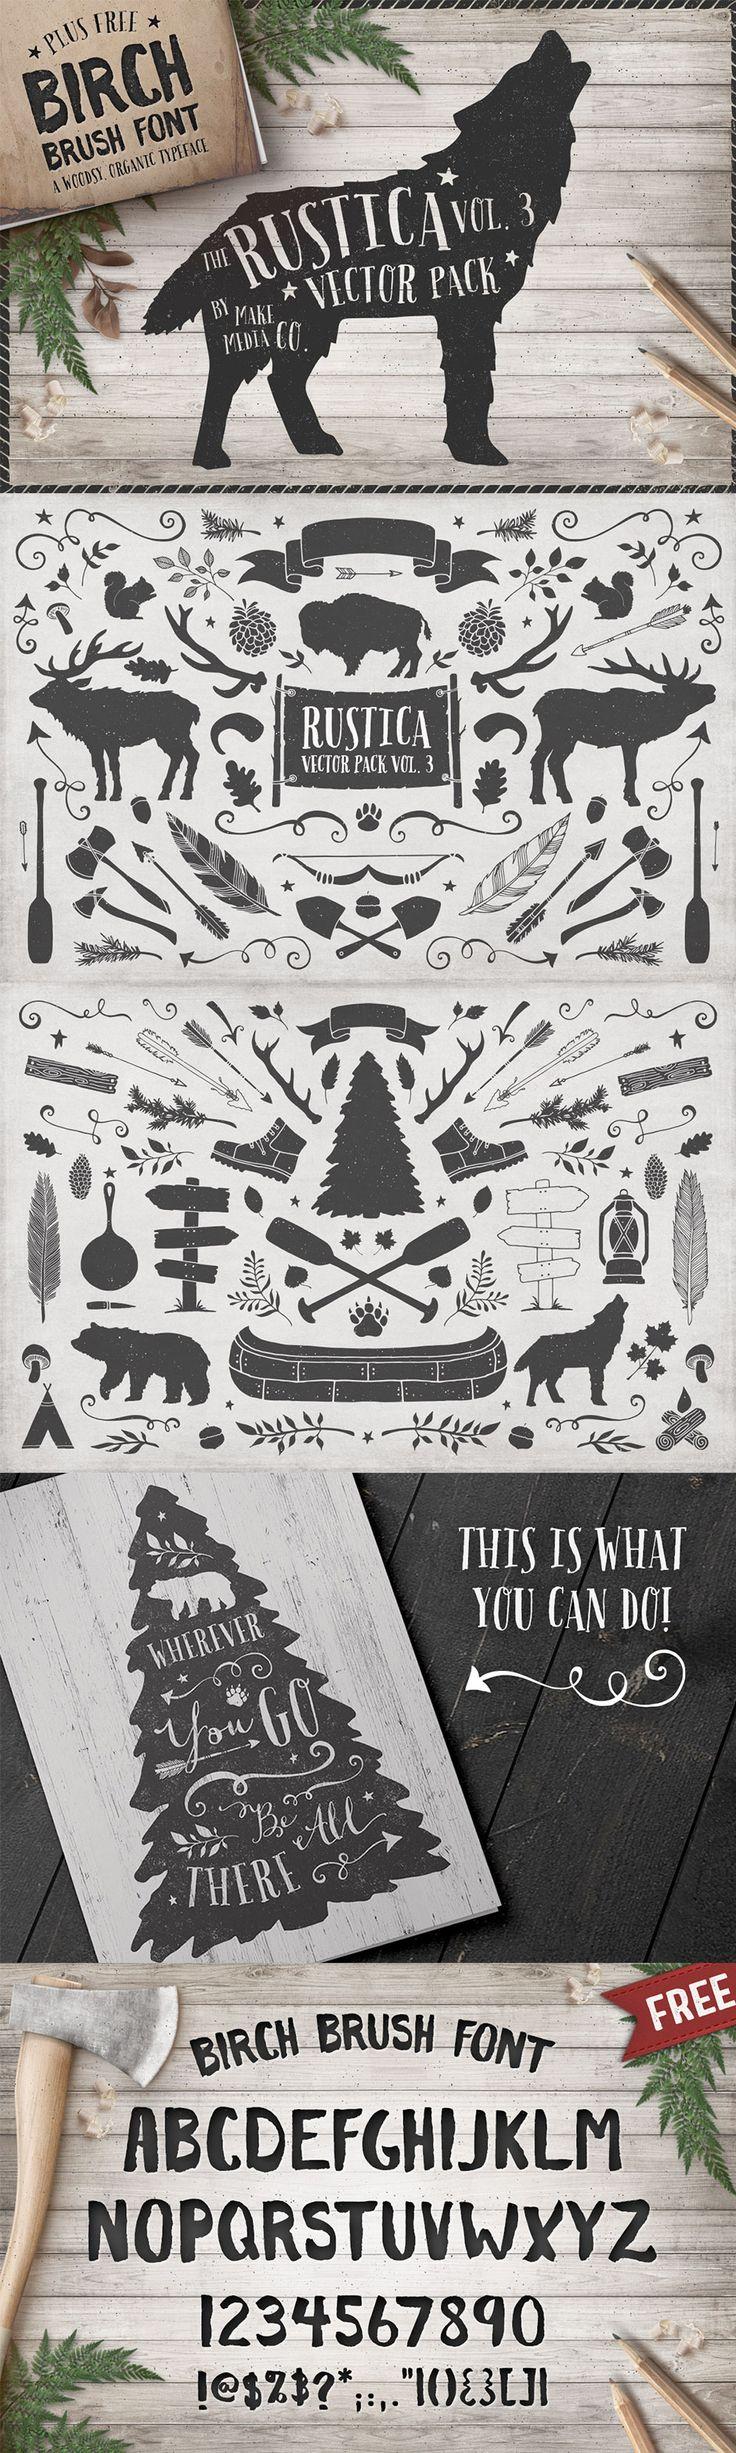 Birch font, plus great wilderness vector ideas